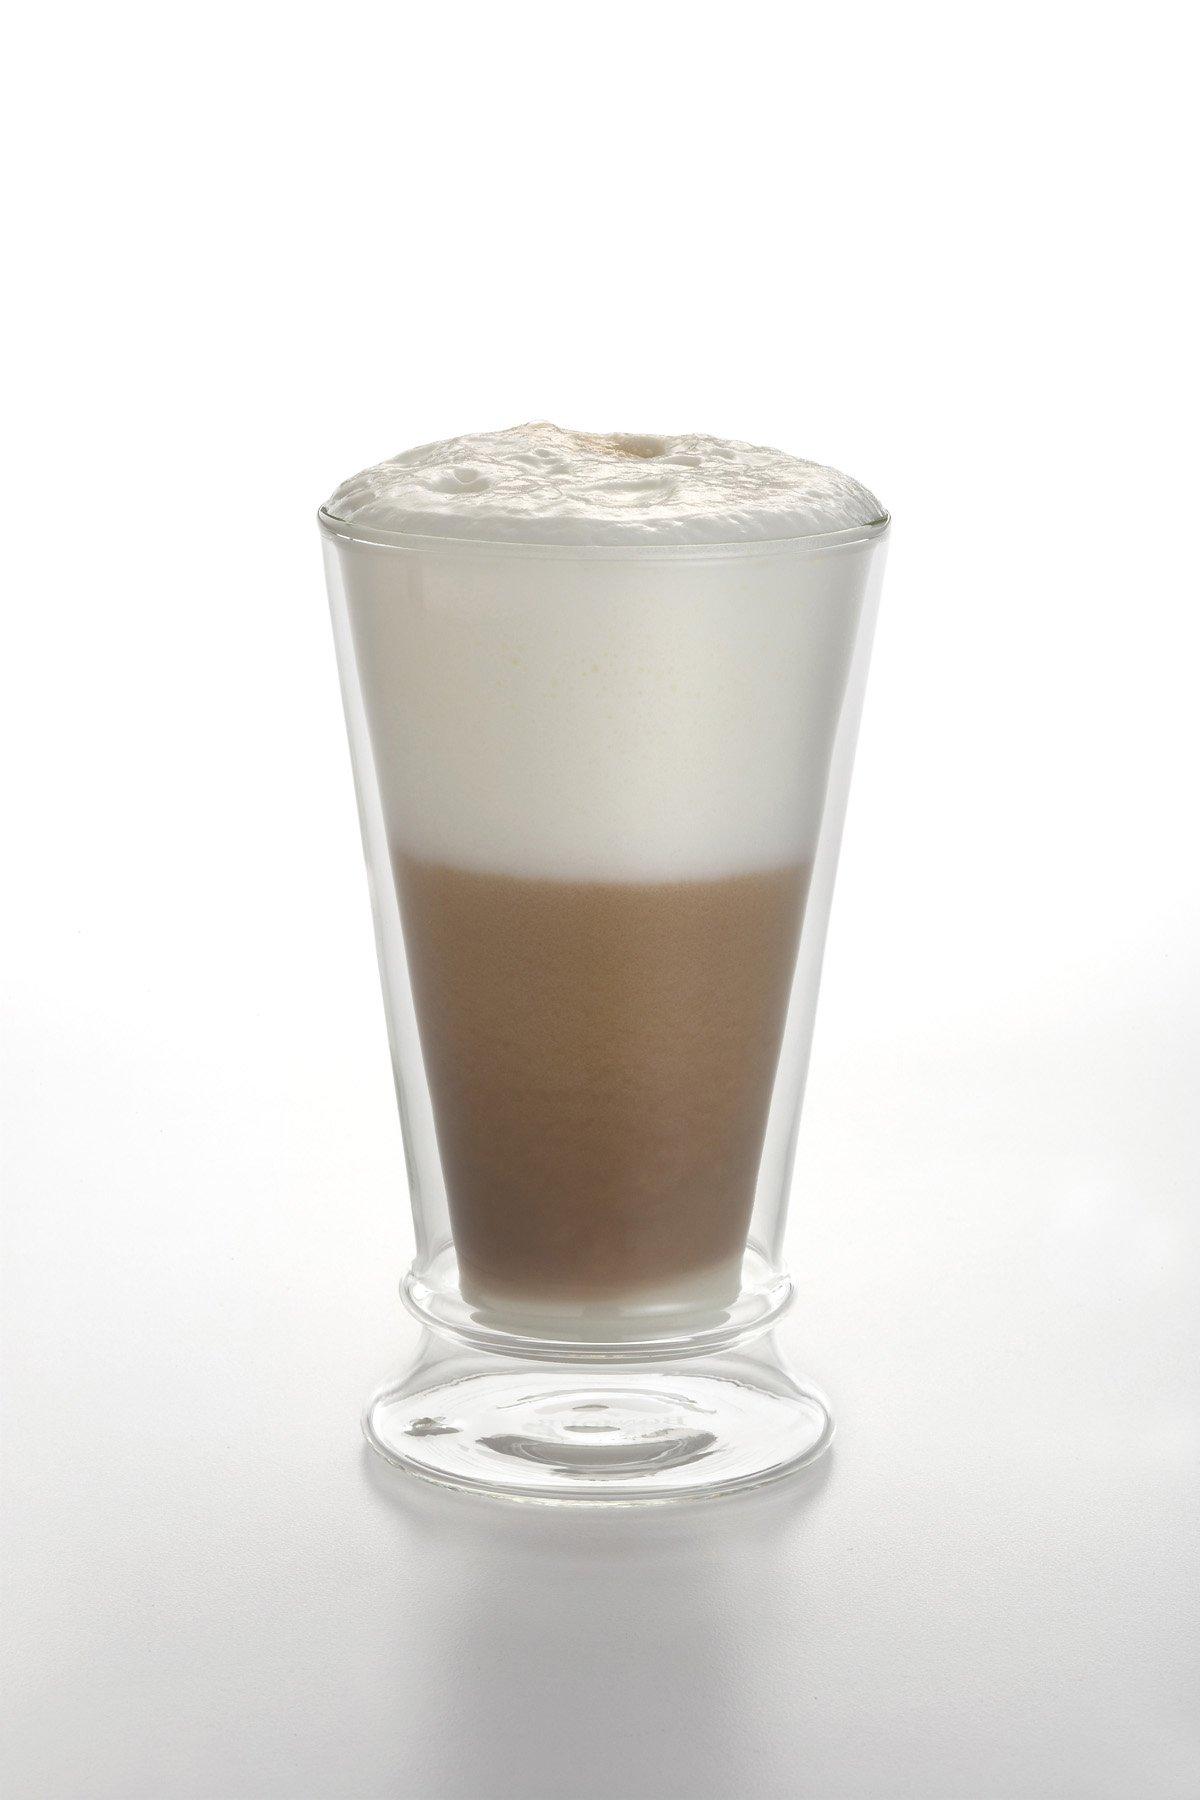 BonJour Coffee Insulated Borosilicate Glass Latte Glasses, 2-Piece Set, 12-Ounces Each by BonJour